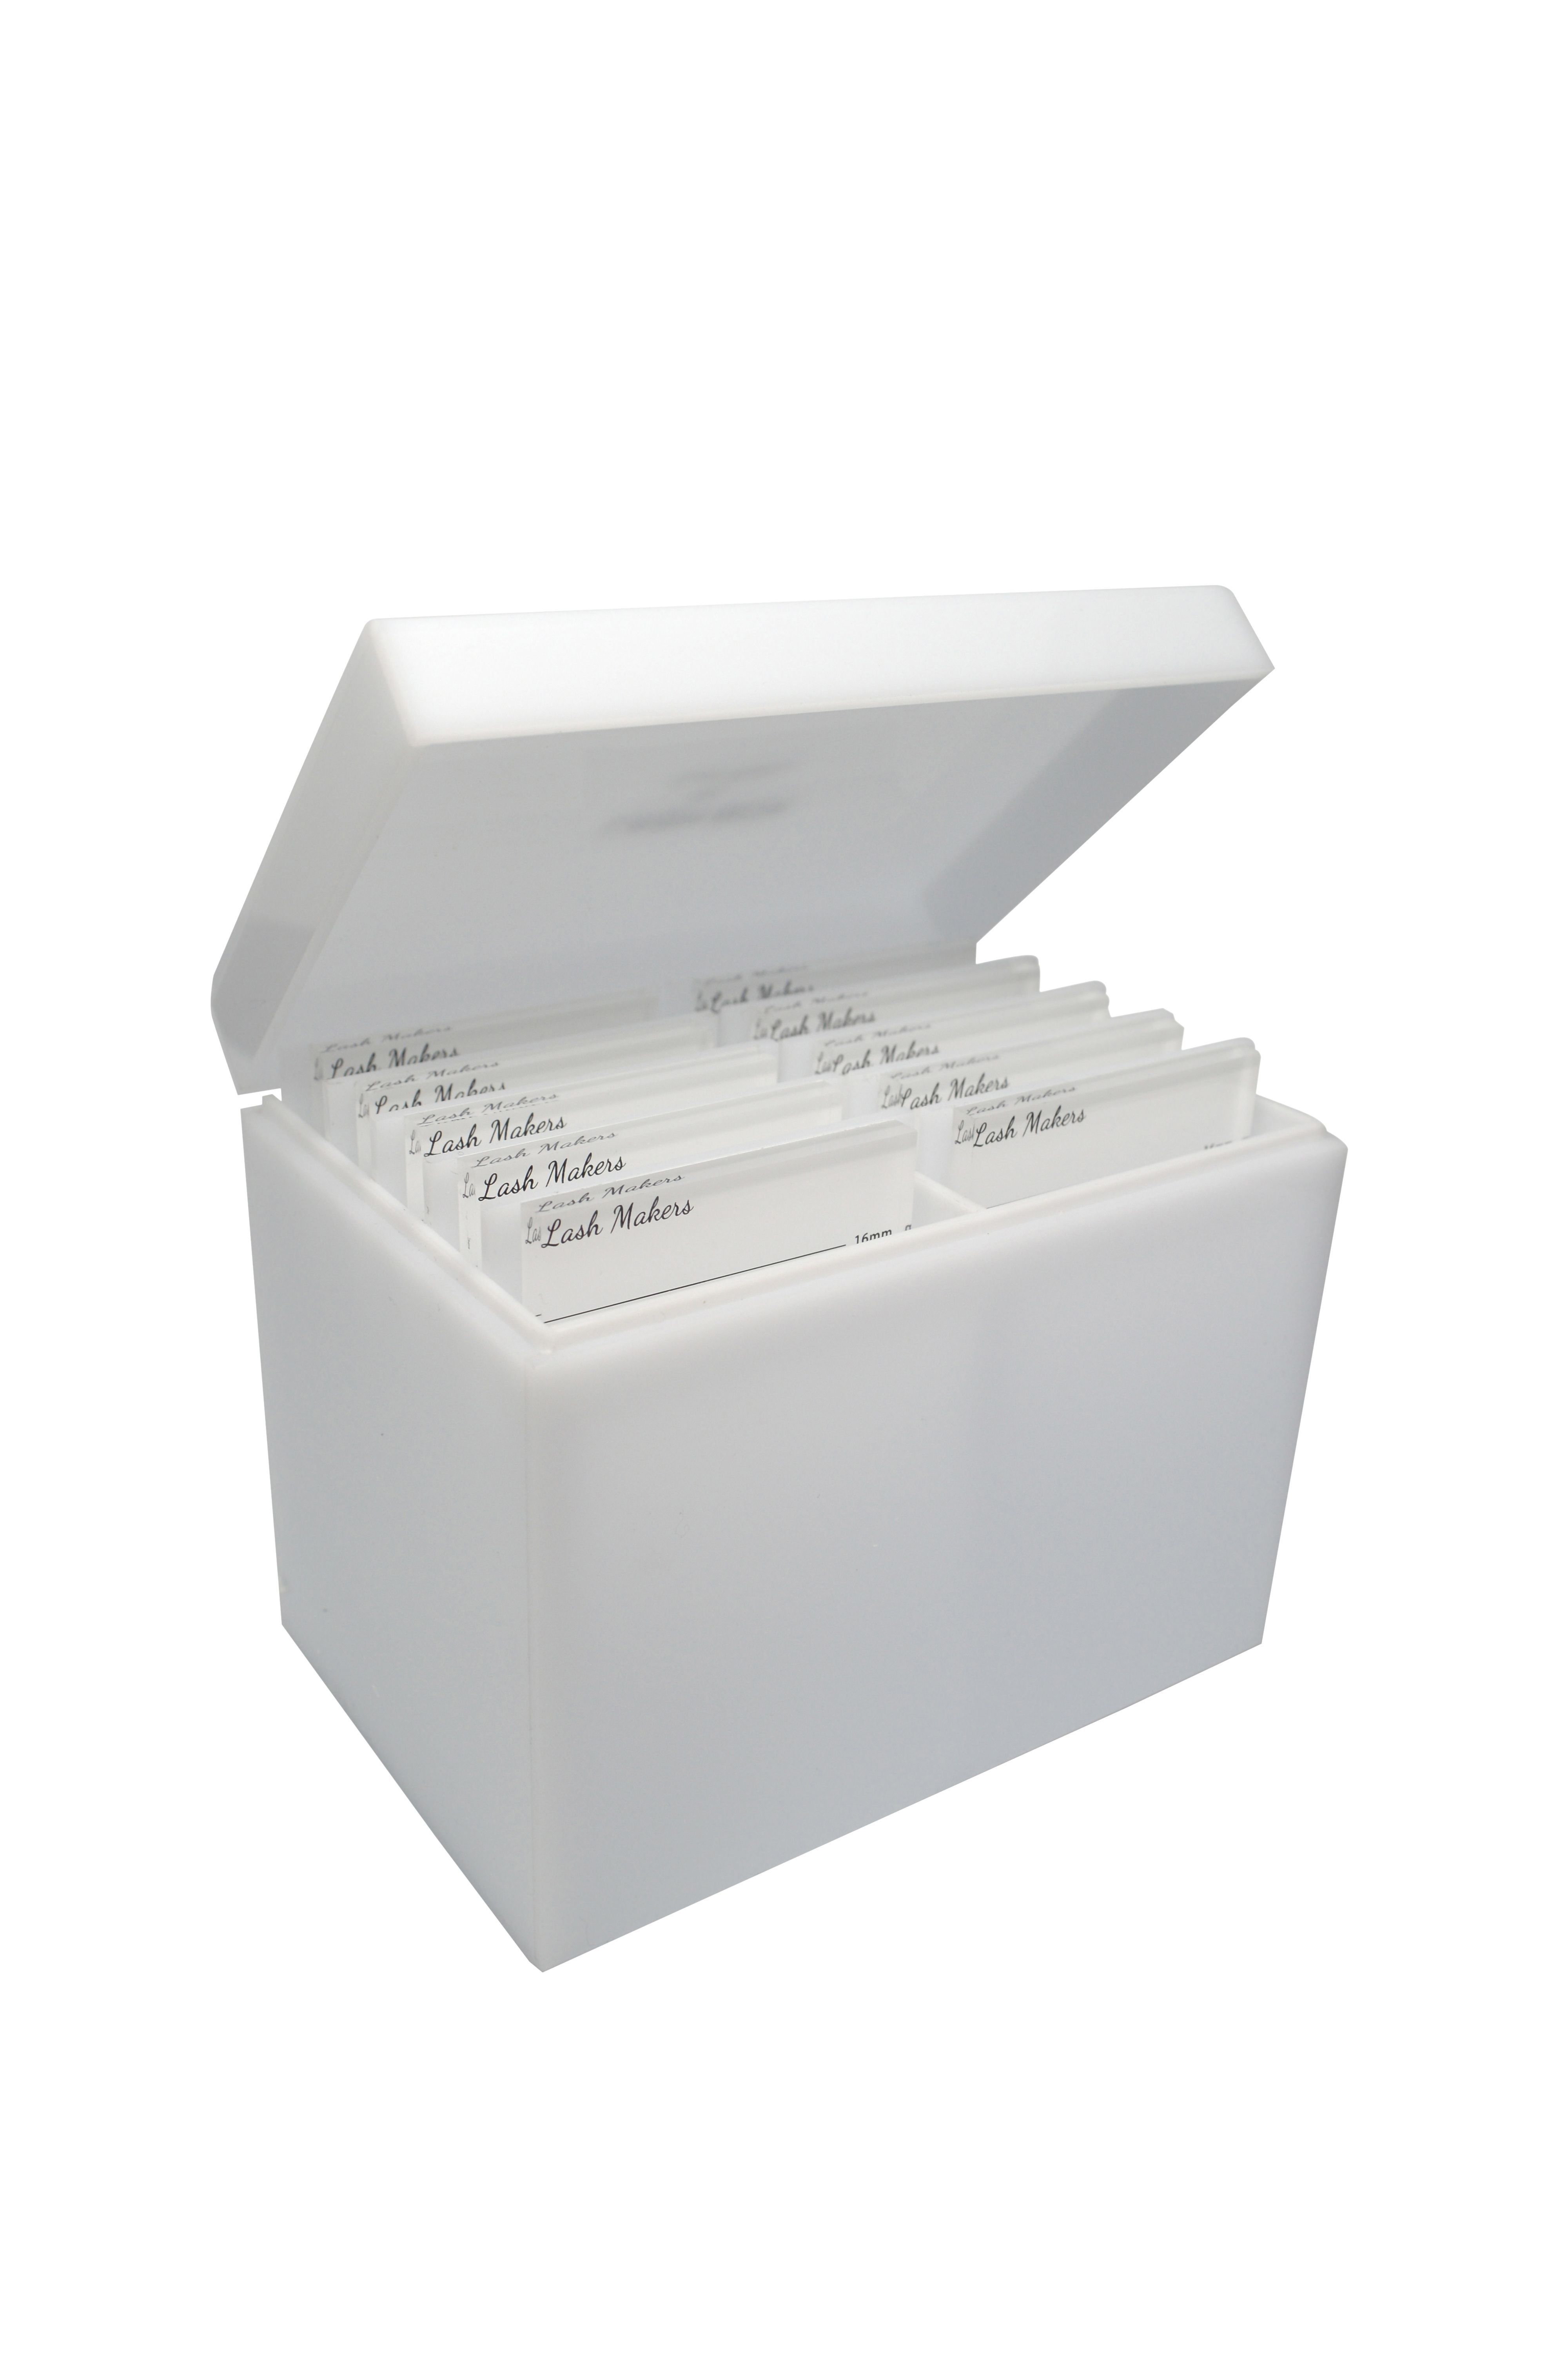 10 Tile Lash Box *Lash Makers Design | cheap meal's in 2019